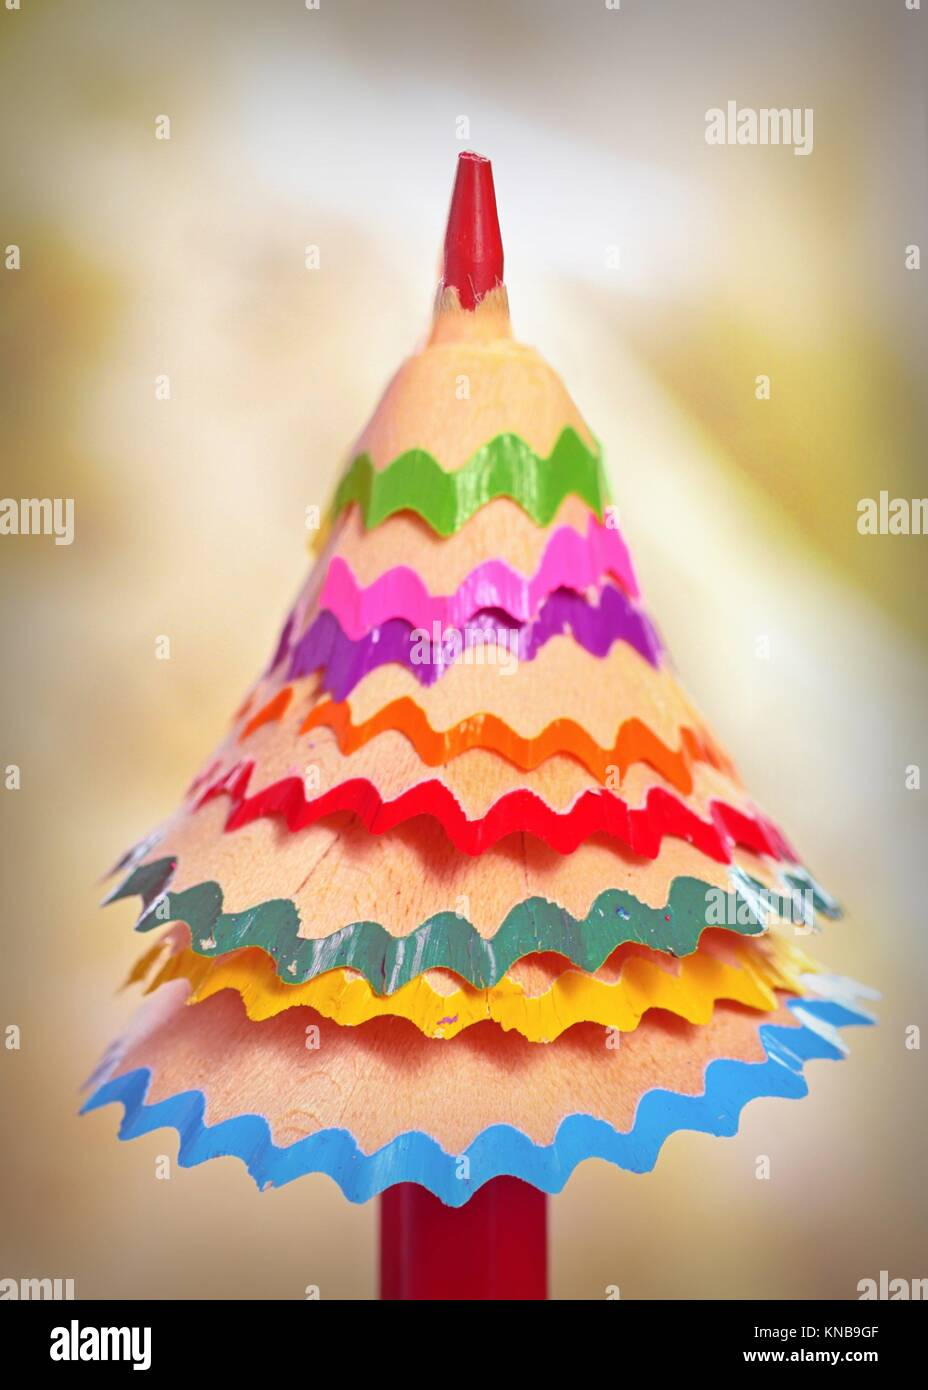 tree made â. ‹â. ‹of colored pencil shavings. - Stock Image